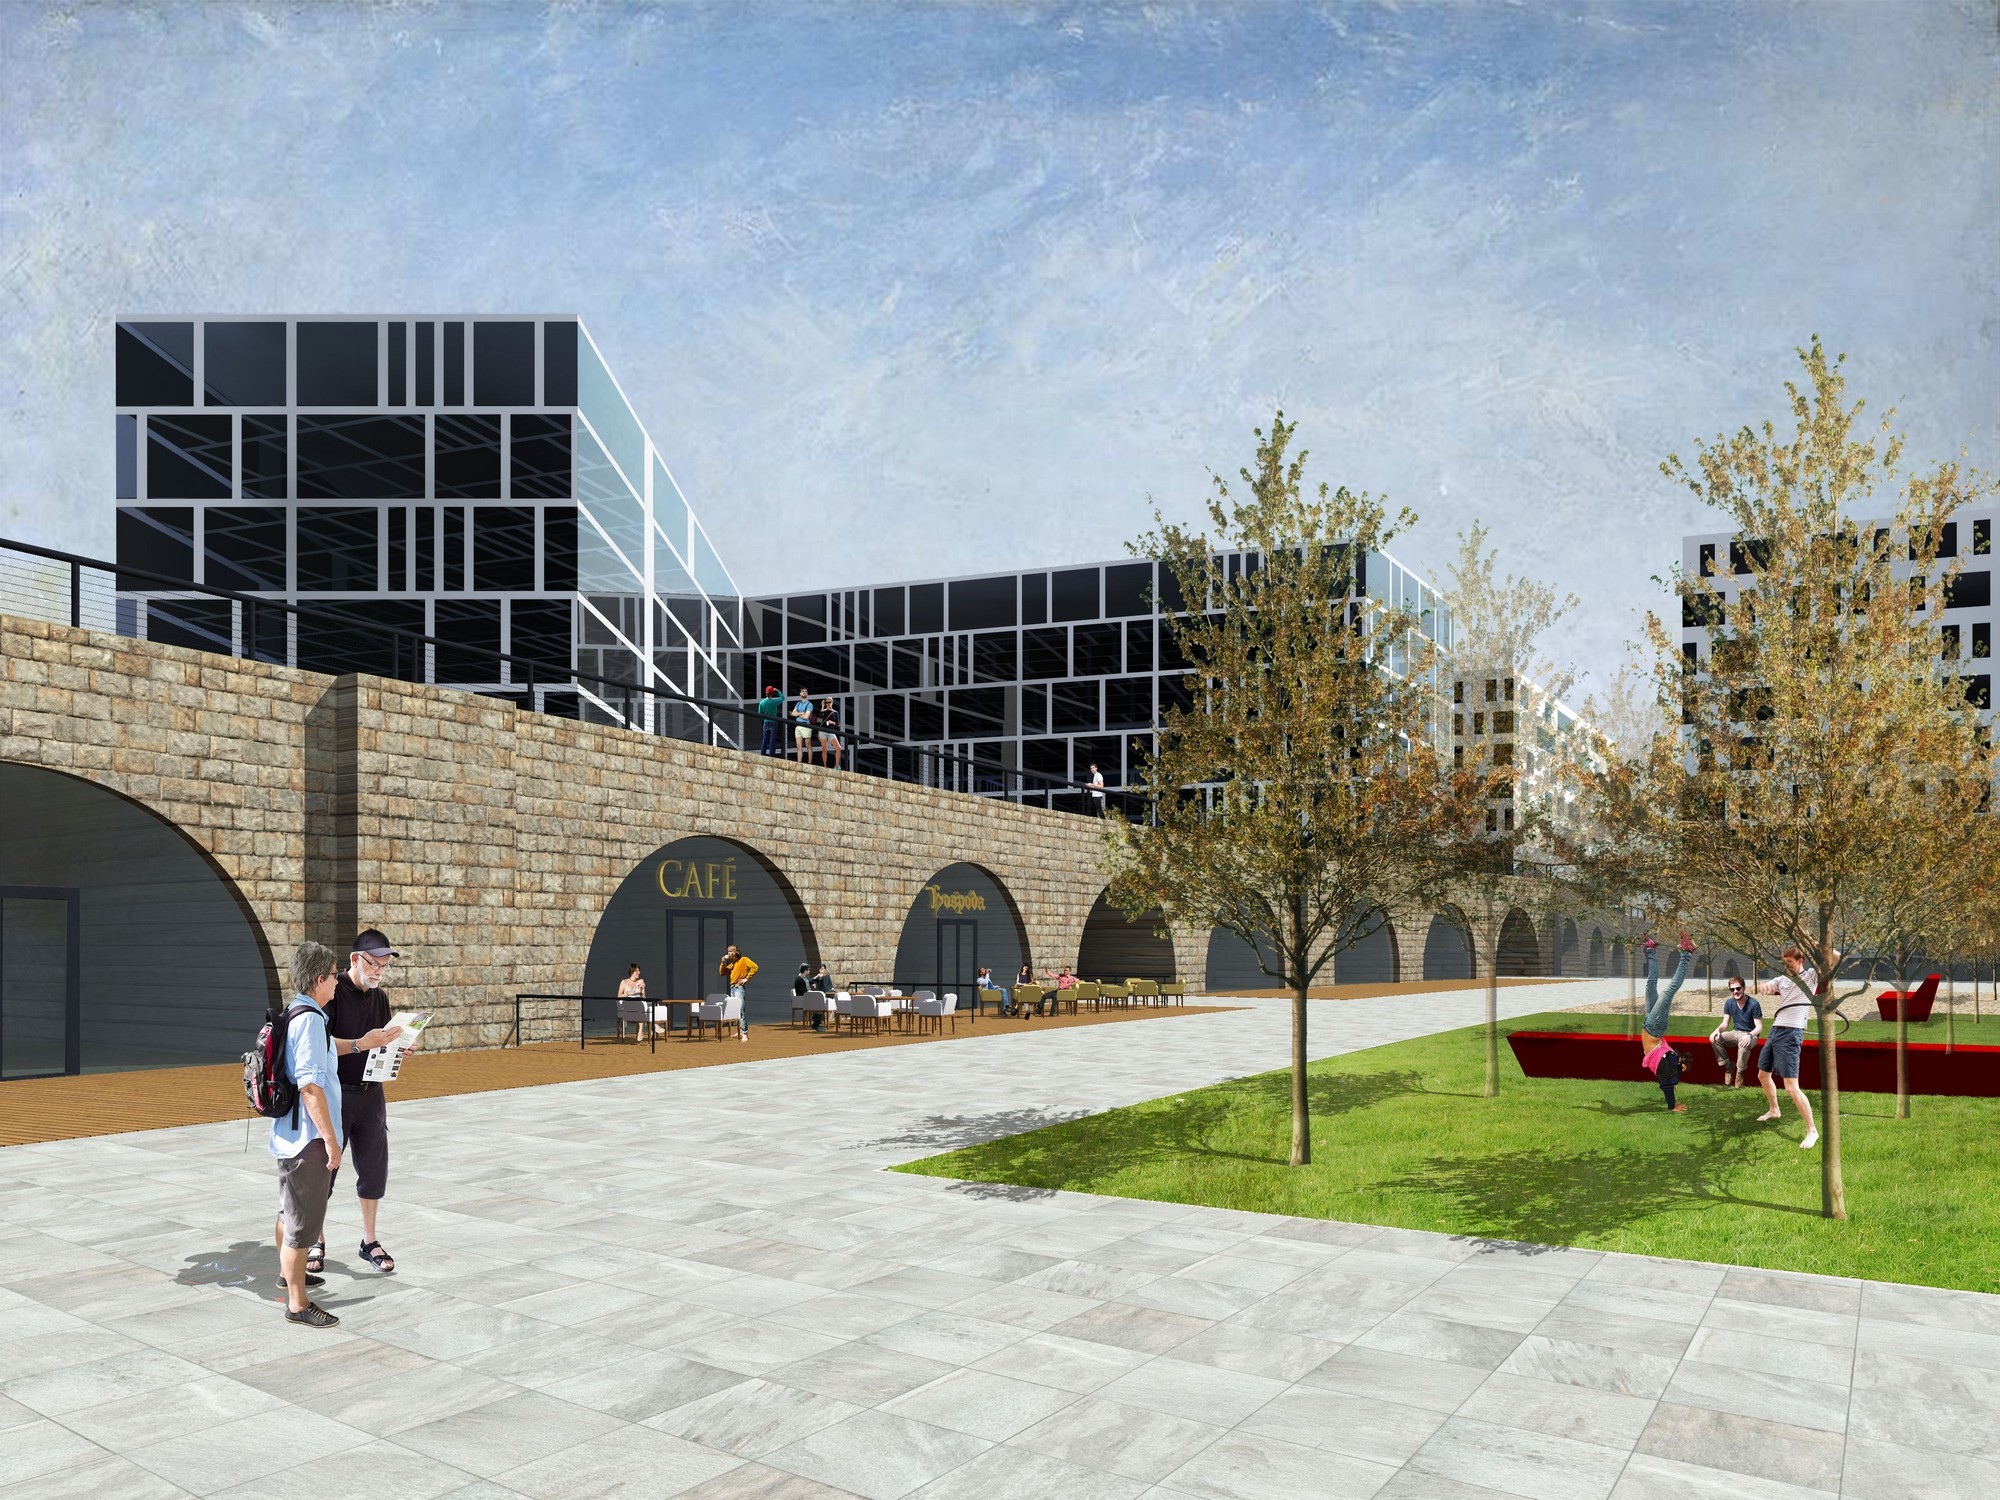 Masarykovo nádraží - image